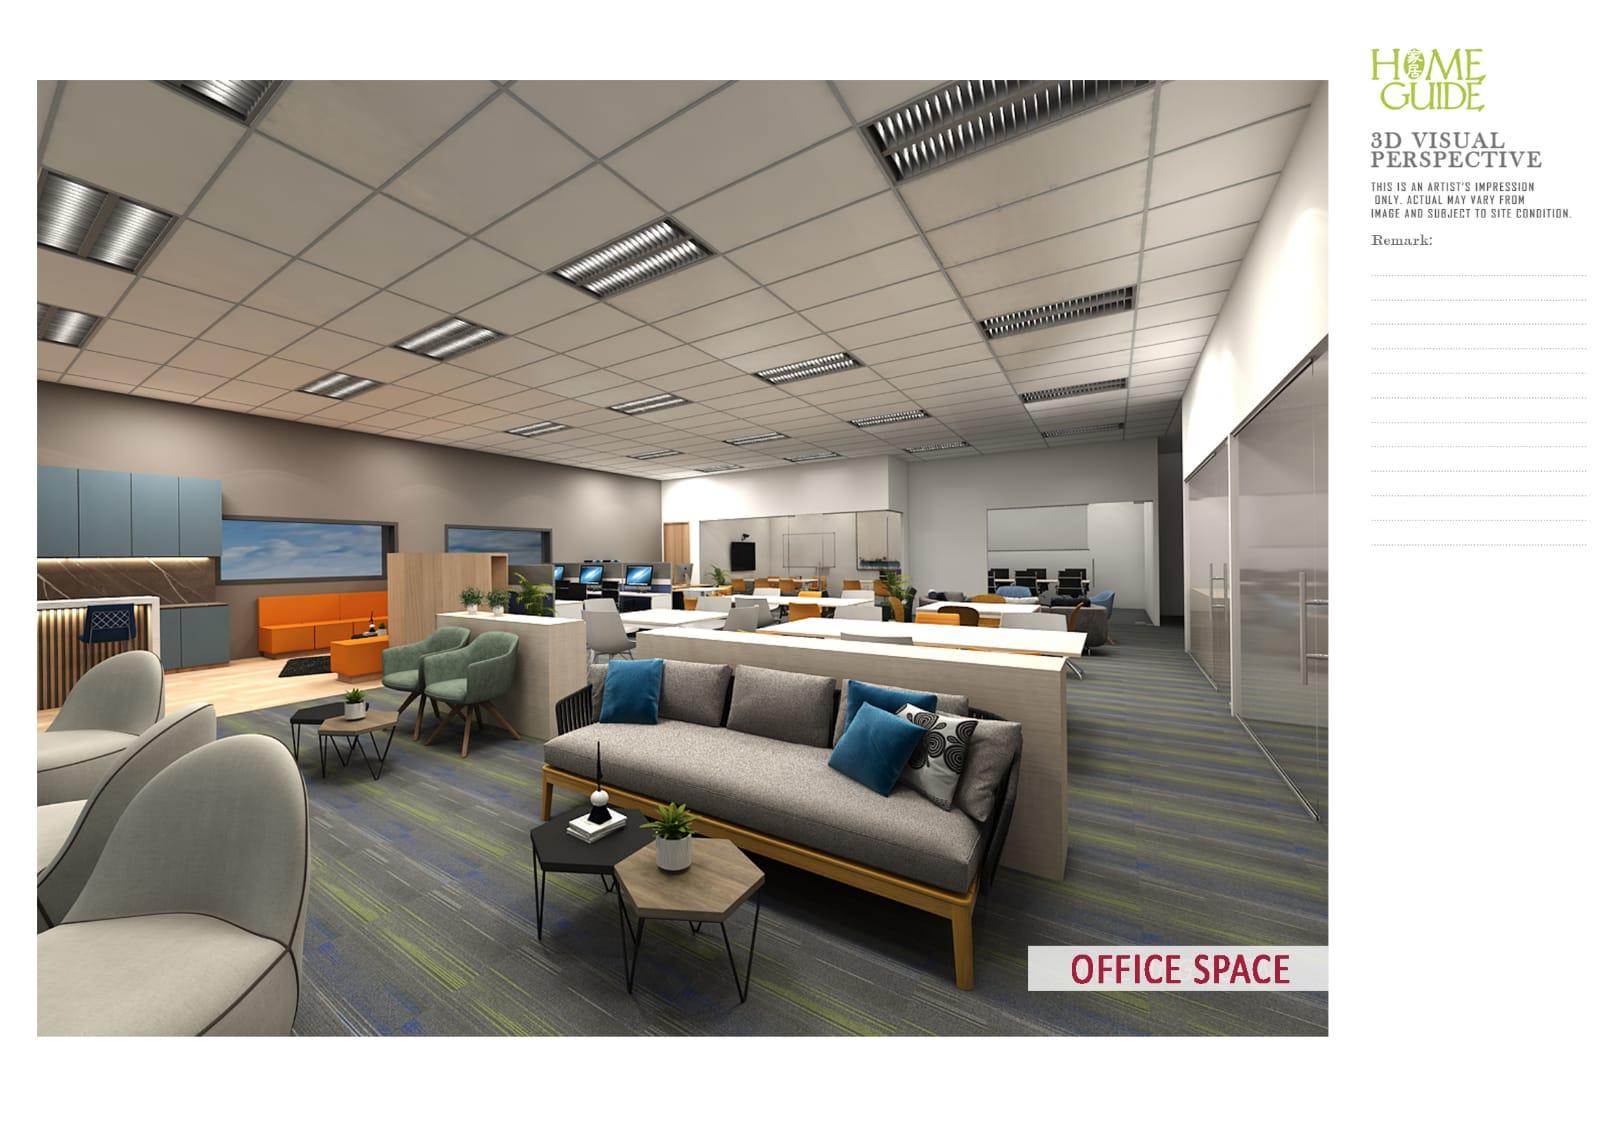 Office Floor Design Ideas from www.officeinteriordesign.com.sg